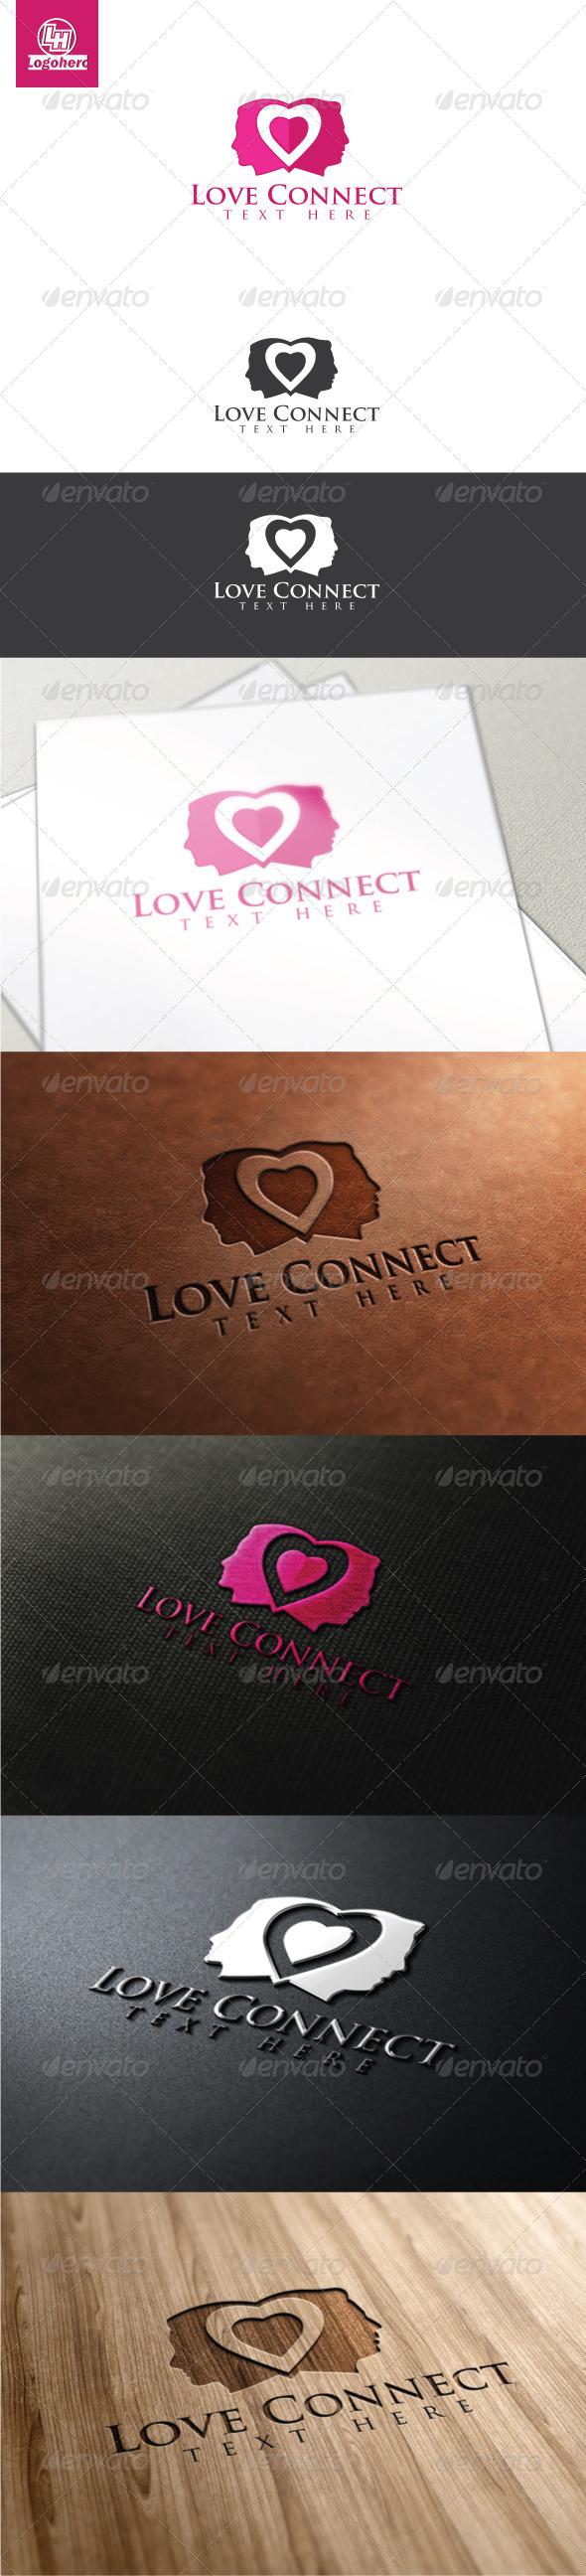 GraphicRiver Love Connect Logo Template 4470135